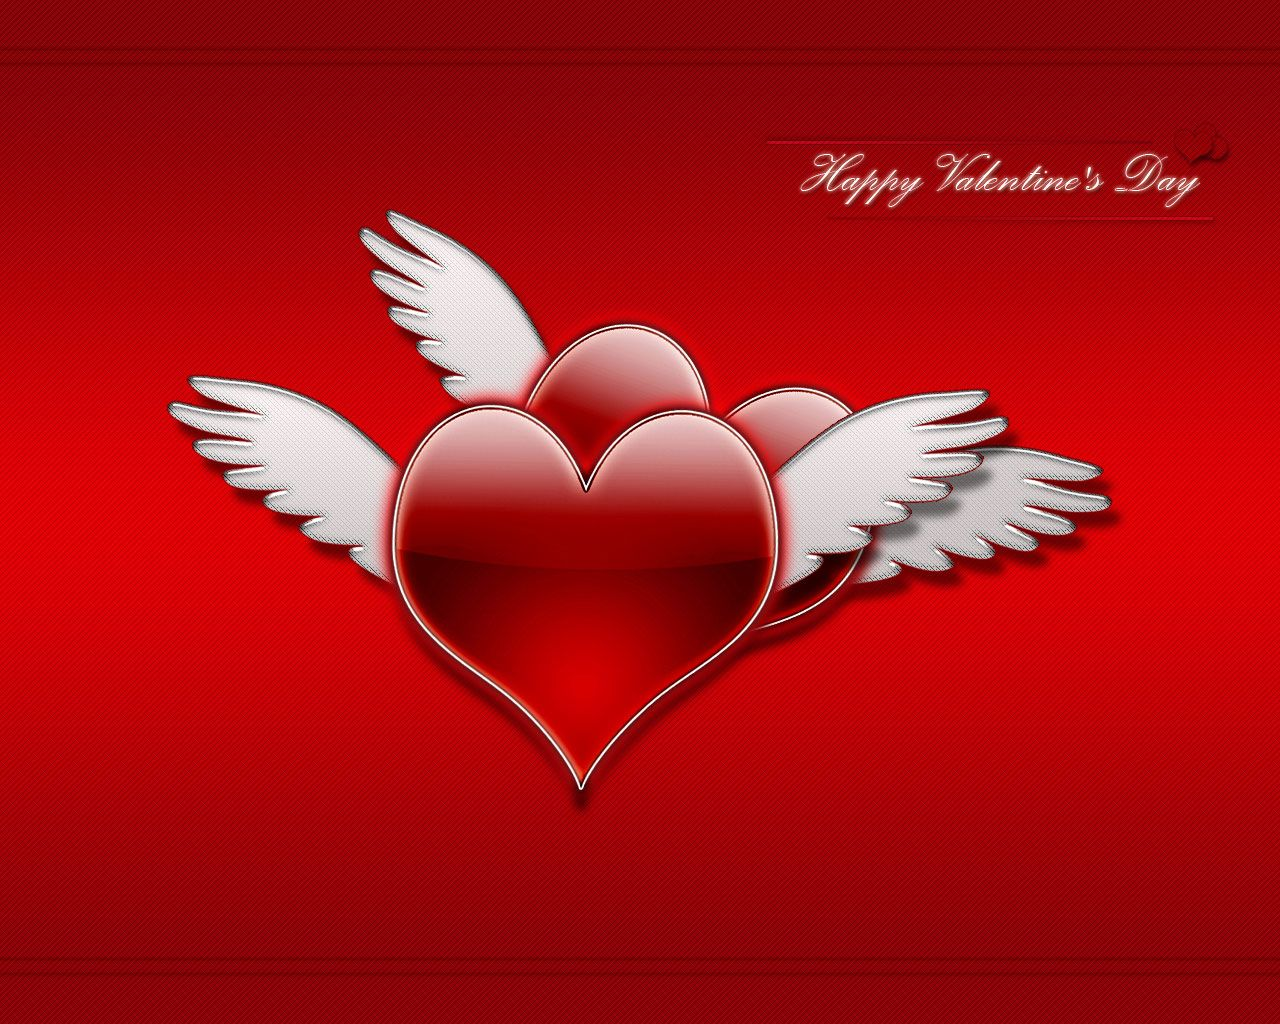 Картинки на день валентина: